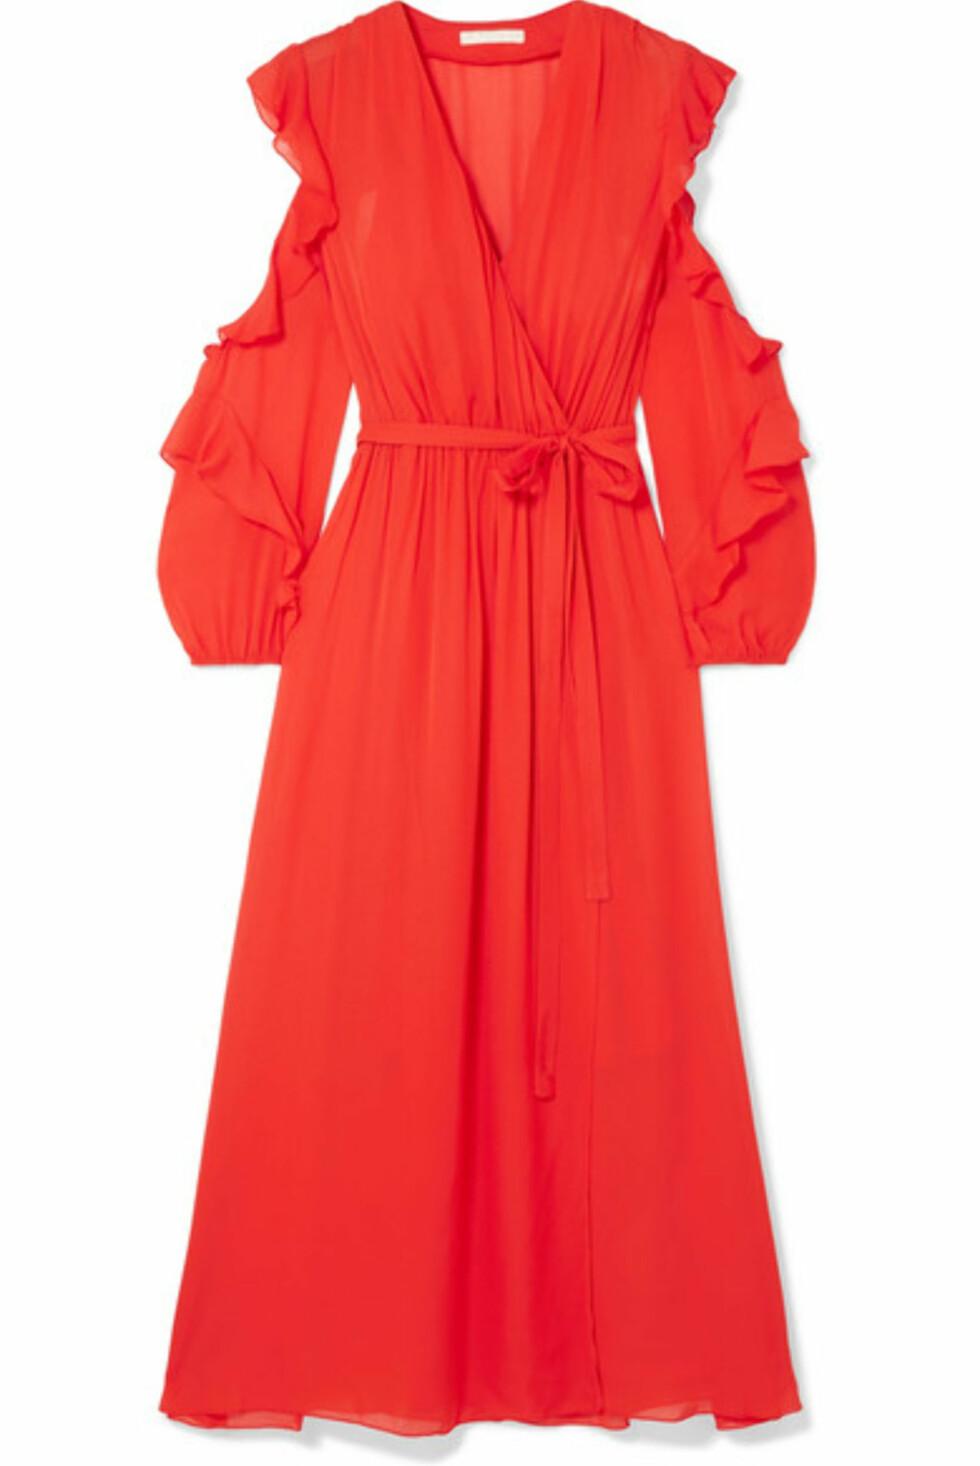 Kjole fra Maje |3830,-| https://www.net-a-porter.com/no/en/product/1047794/maje/ruffled-wrap-effect-chiffon-midi-dress